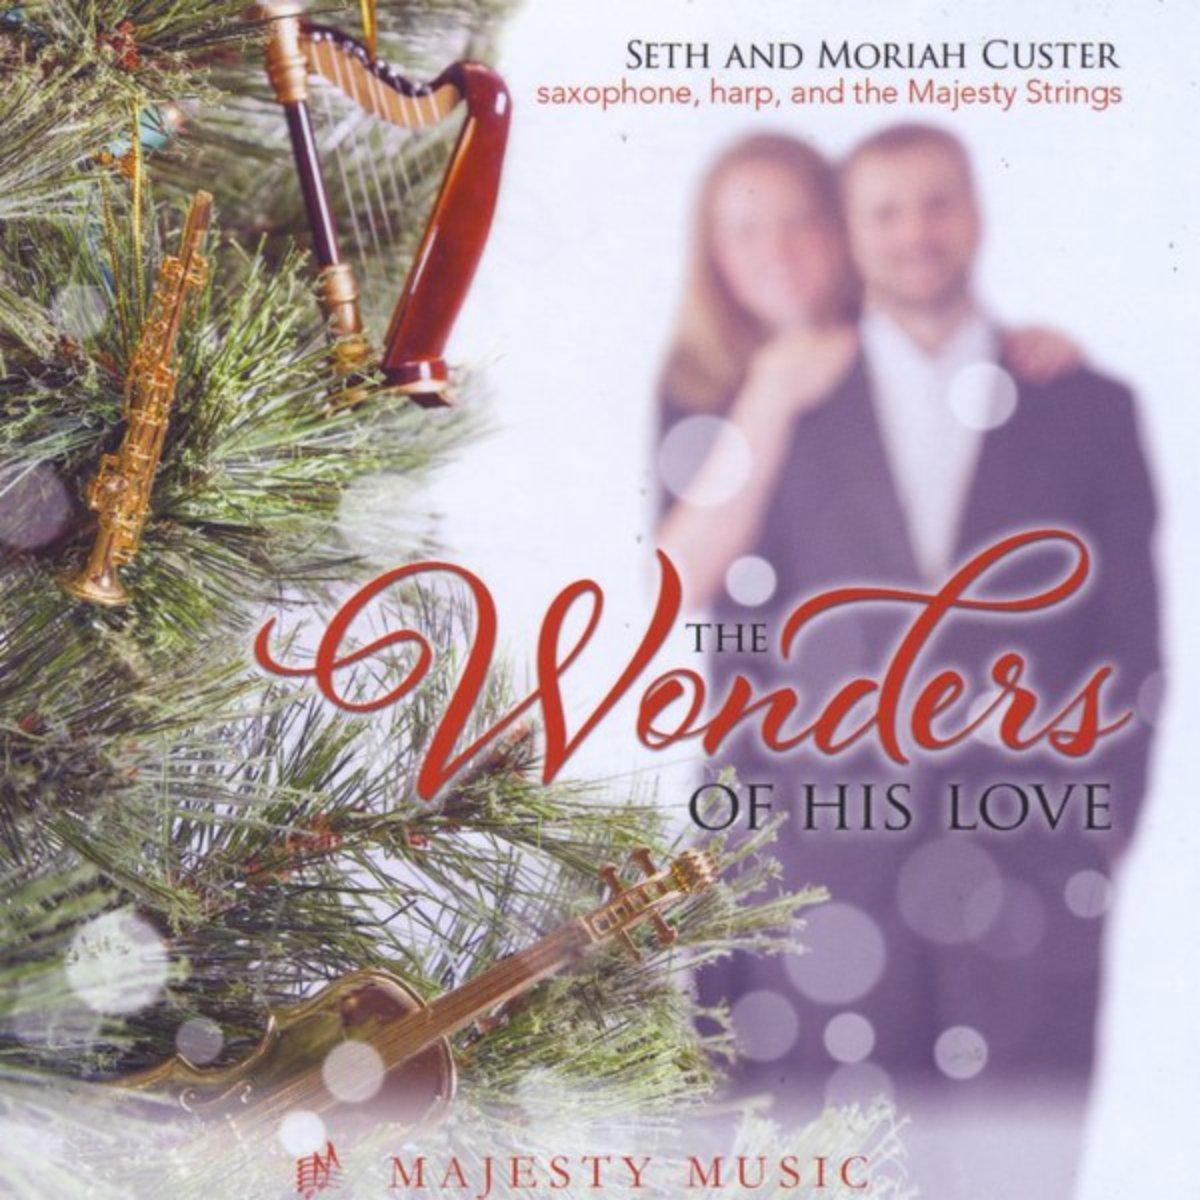 Seth And Moriah Custer – The Wonders Of His Love (2014) [FLAC]